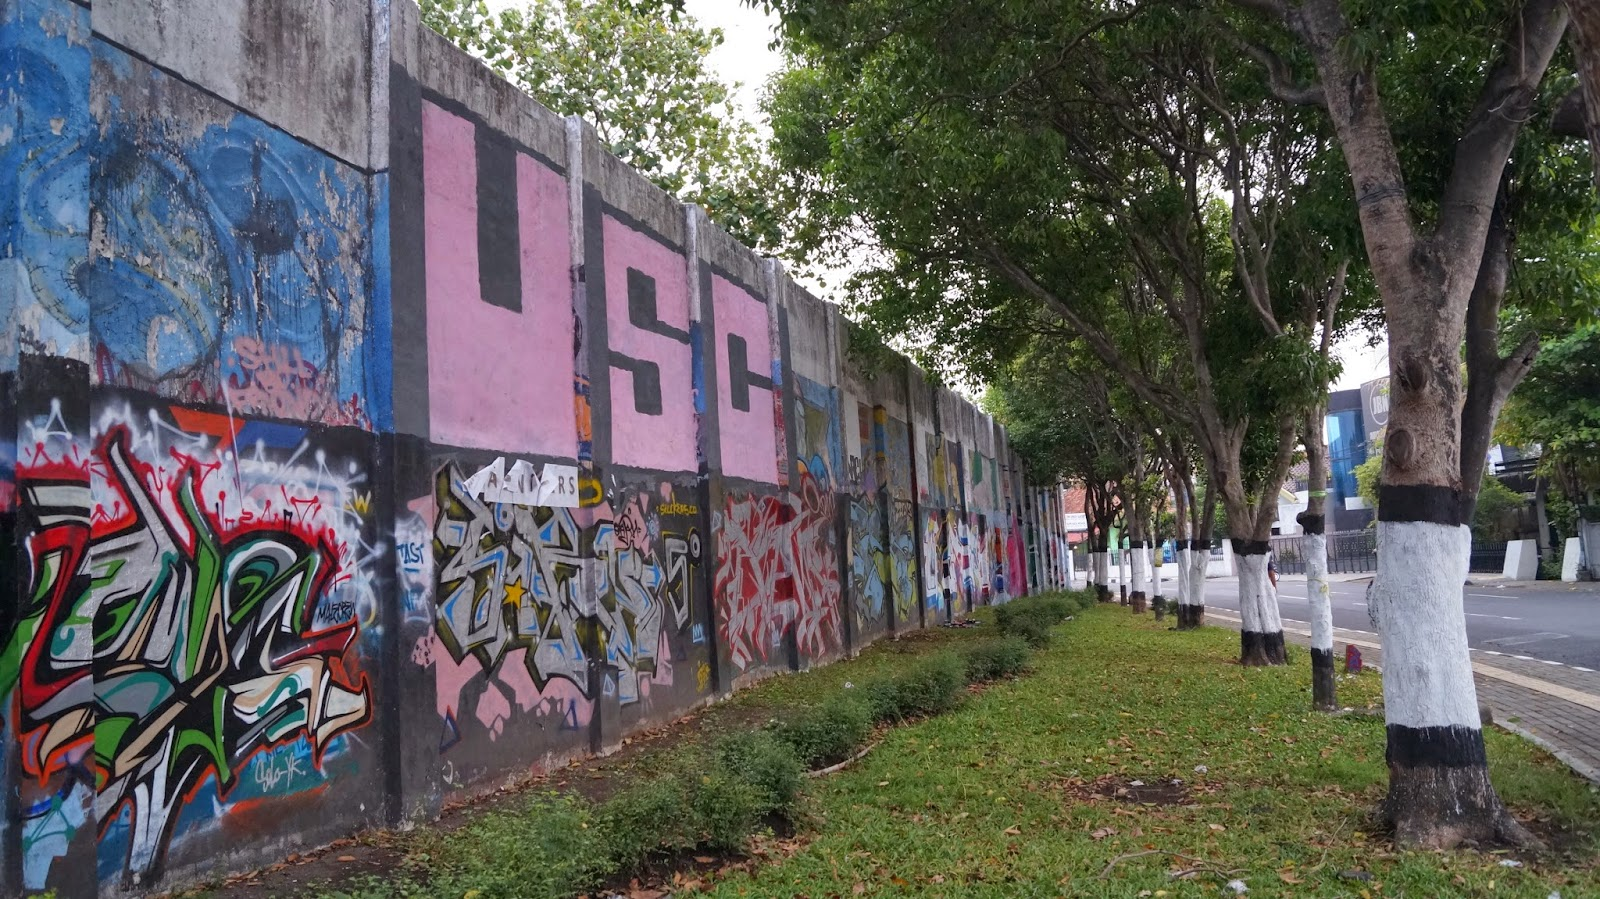 Wisata graffiti jogja di stadion kridosono kotabaru